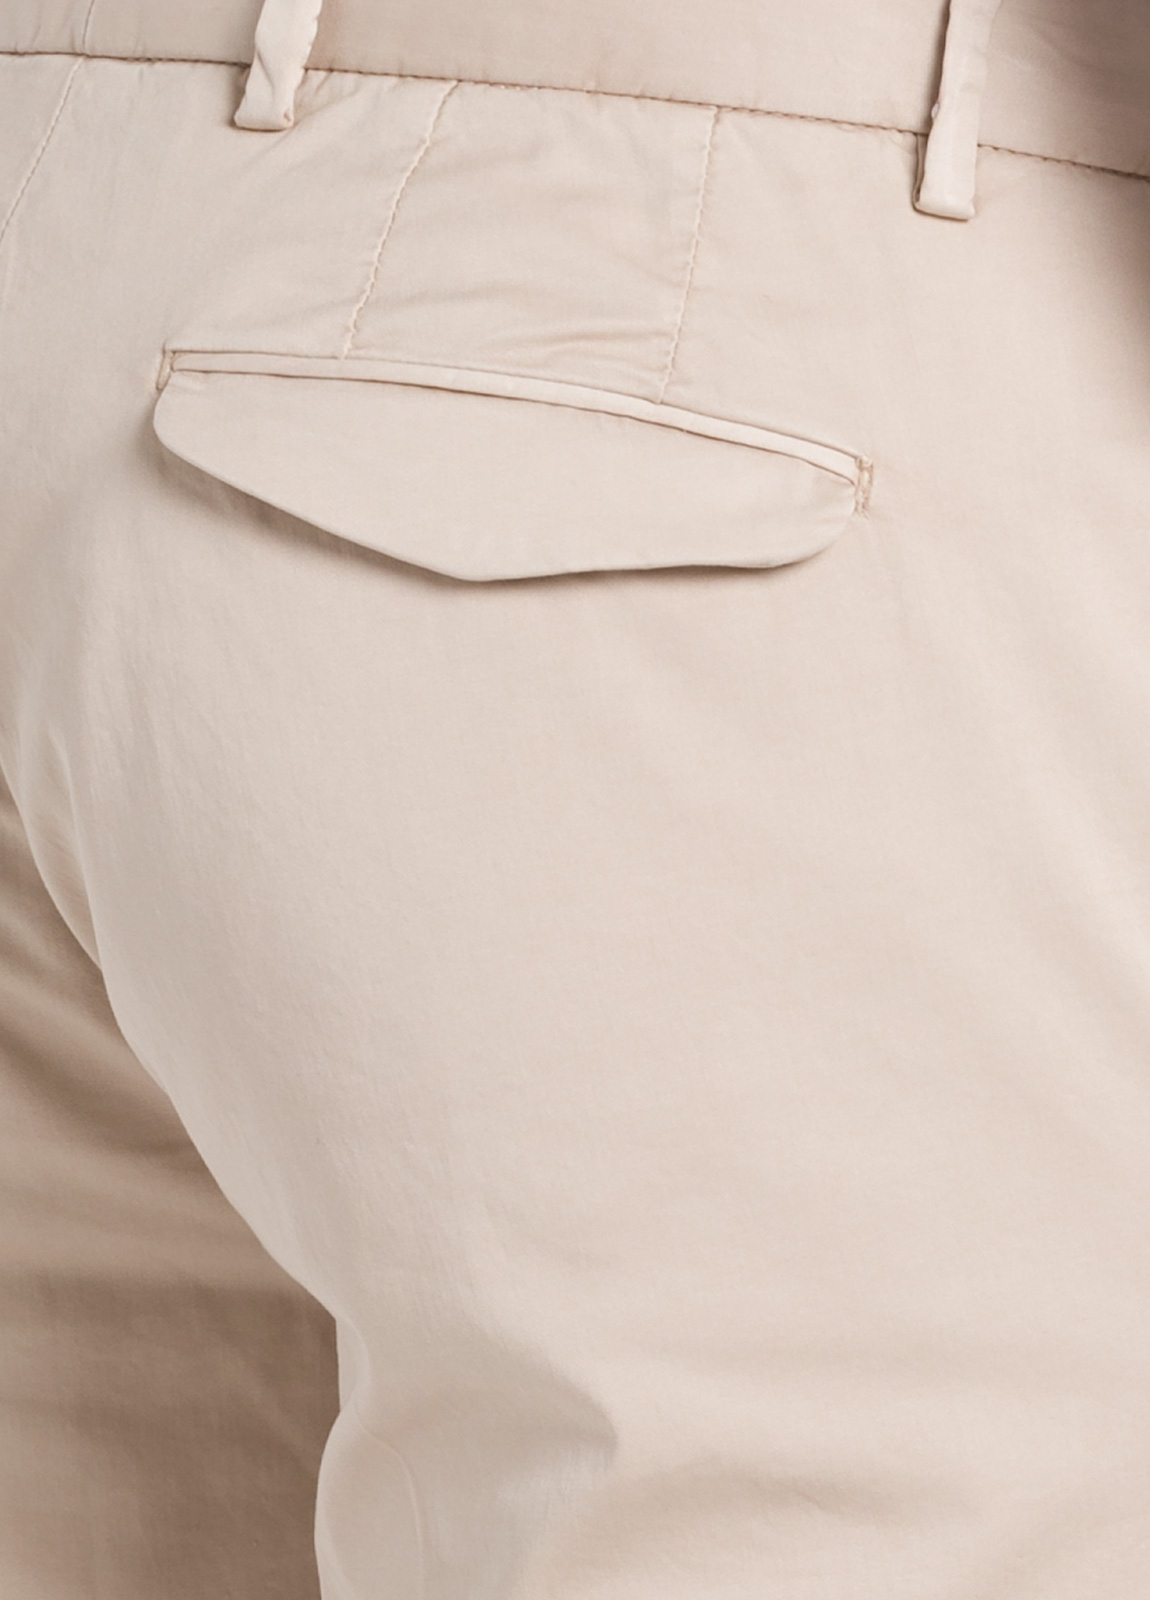 Pantalón modelo slim fit 1 pinza color beige. 97% Algodón 3% Ea. - Ítem1